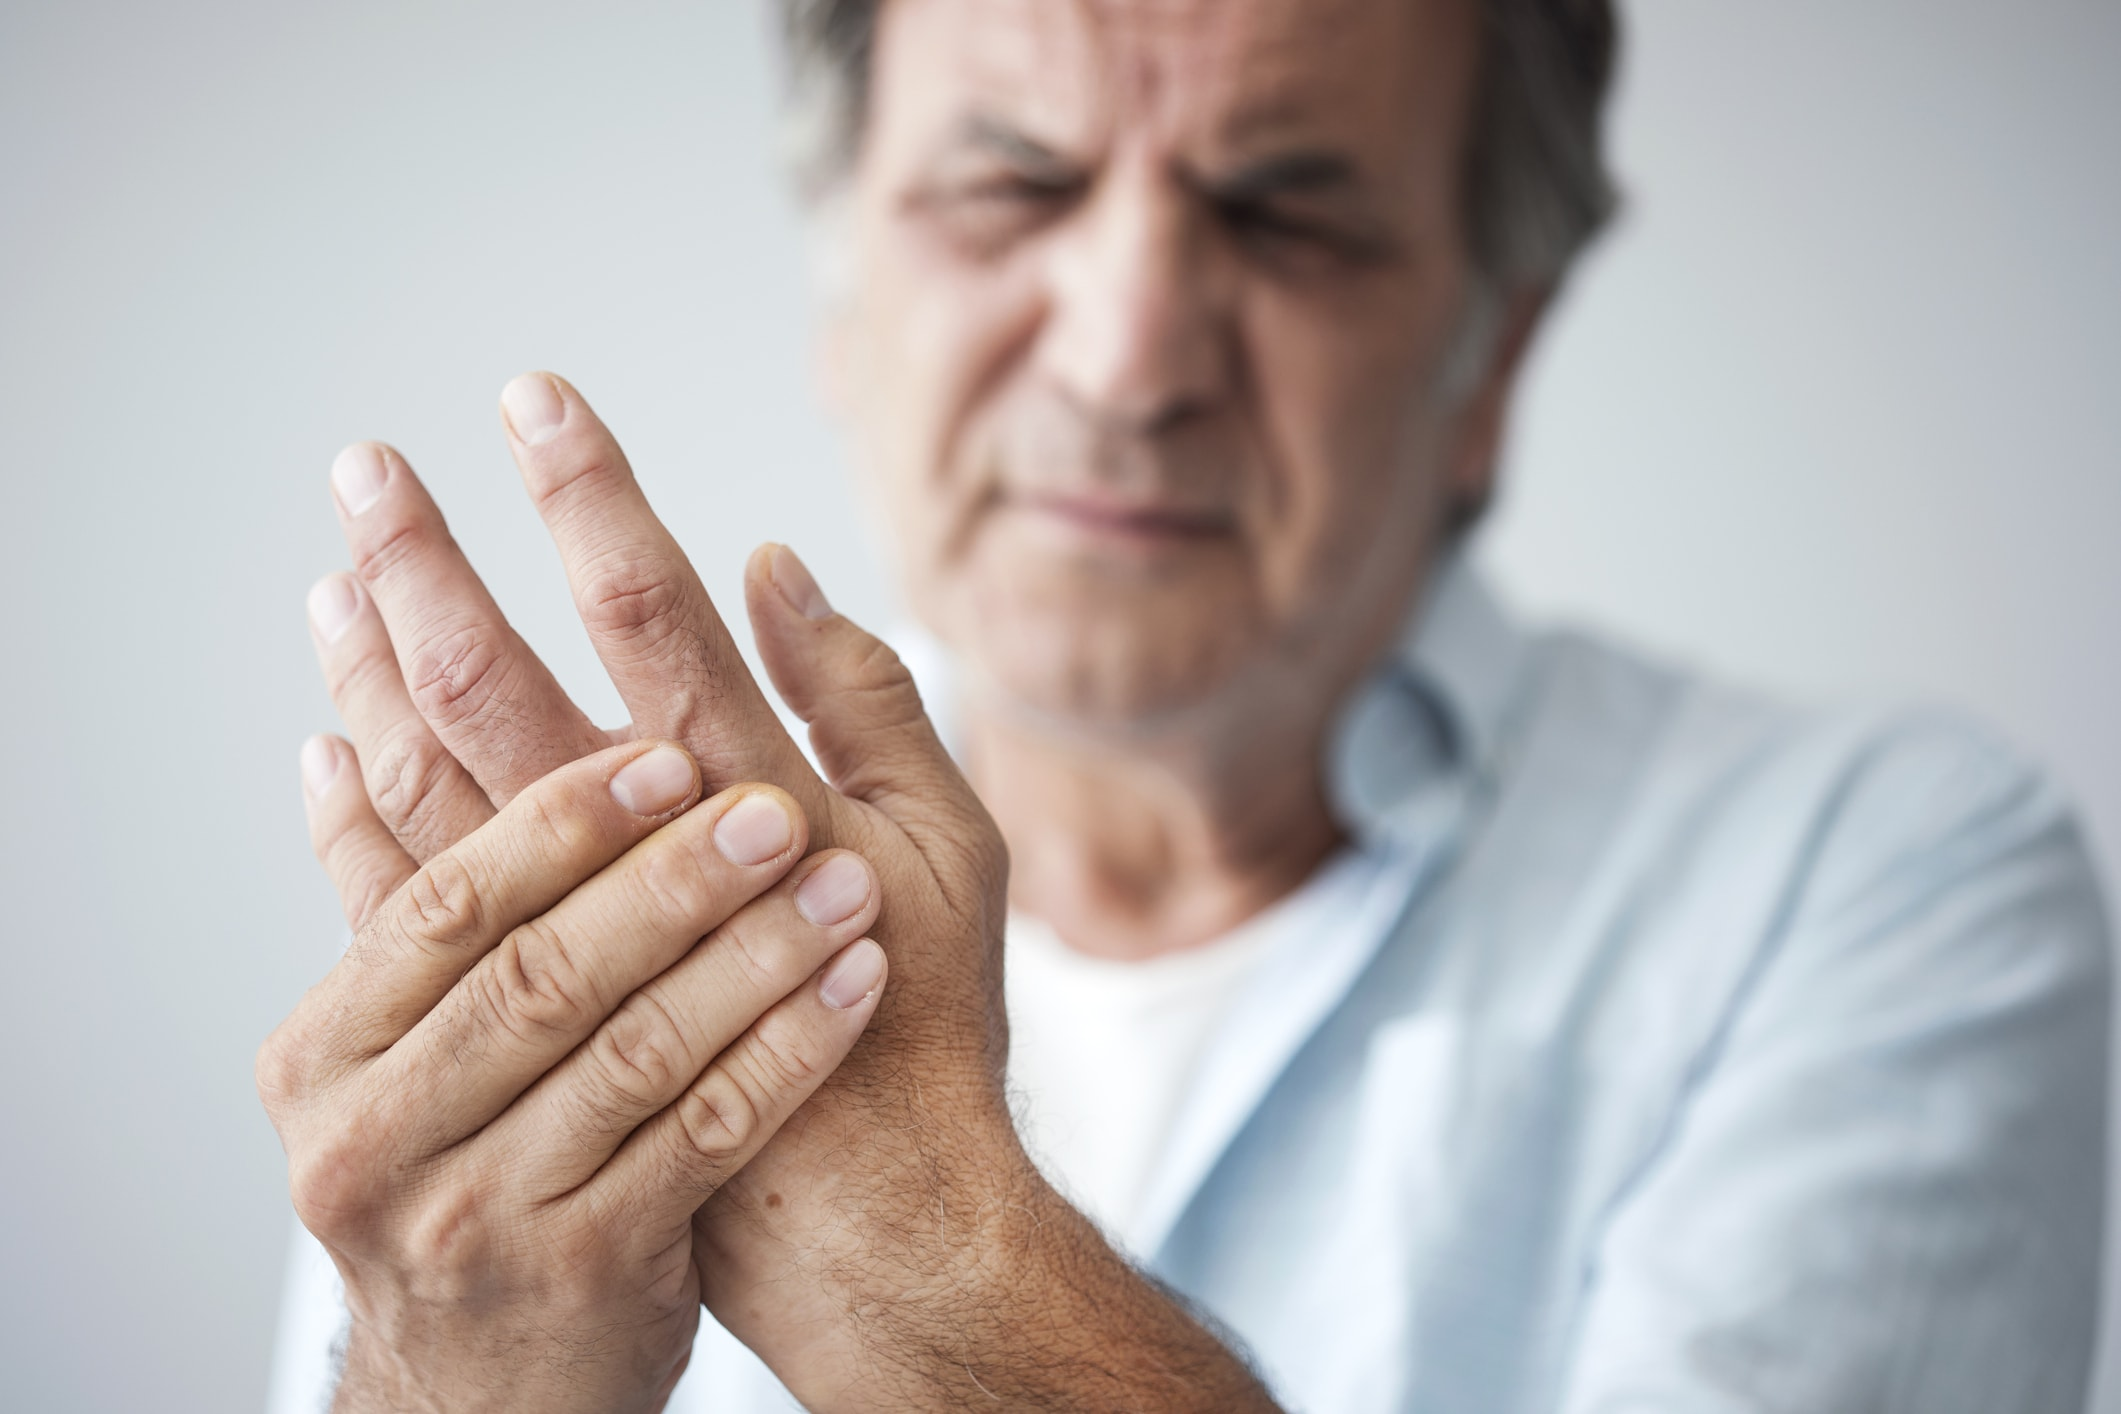 Rheuma in der Hand